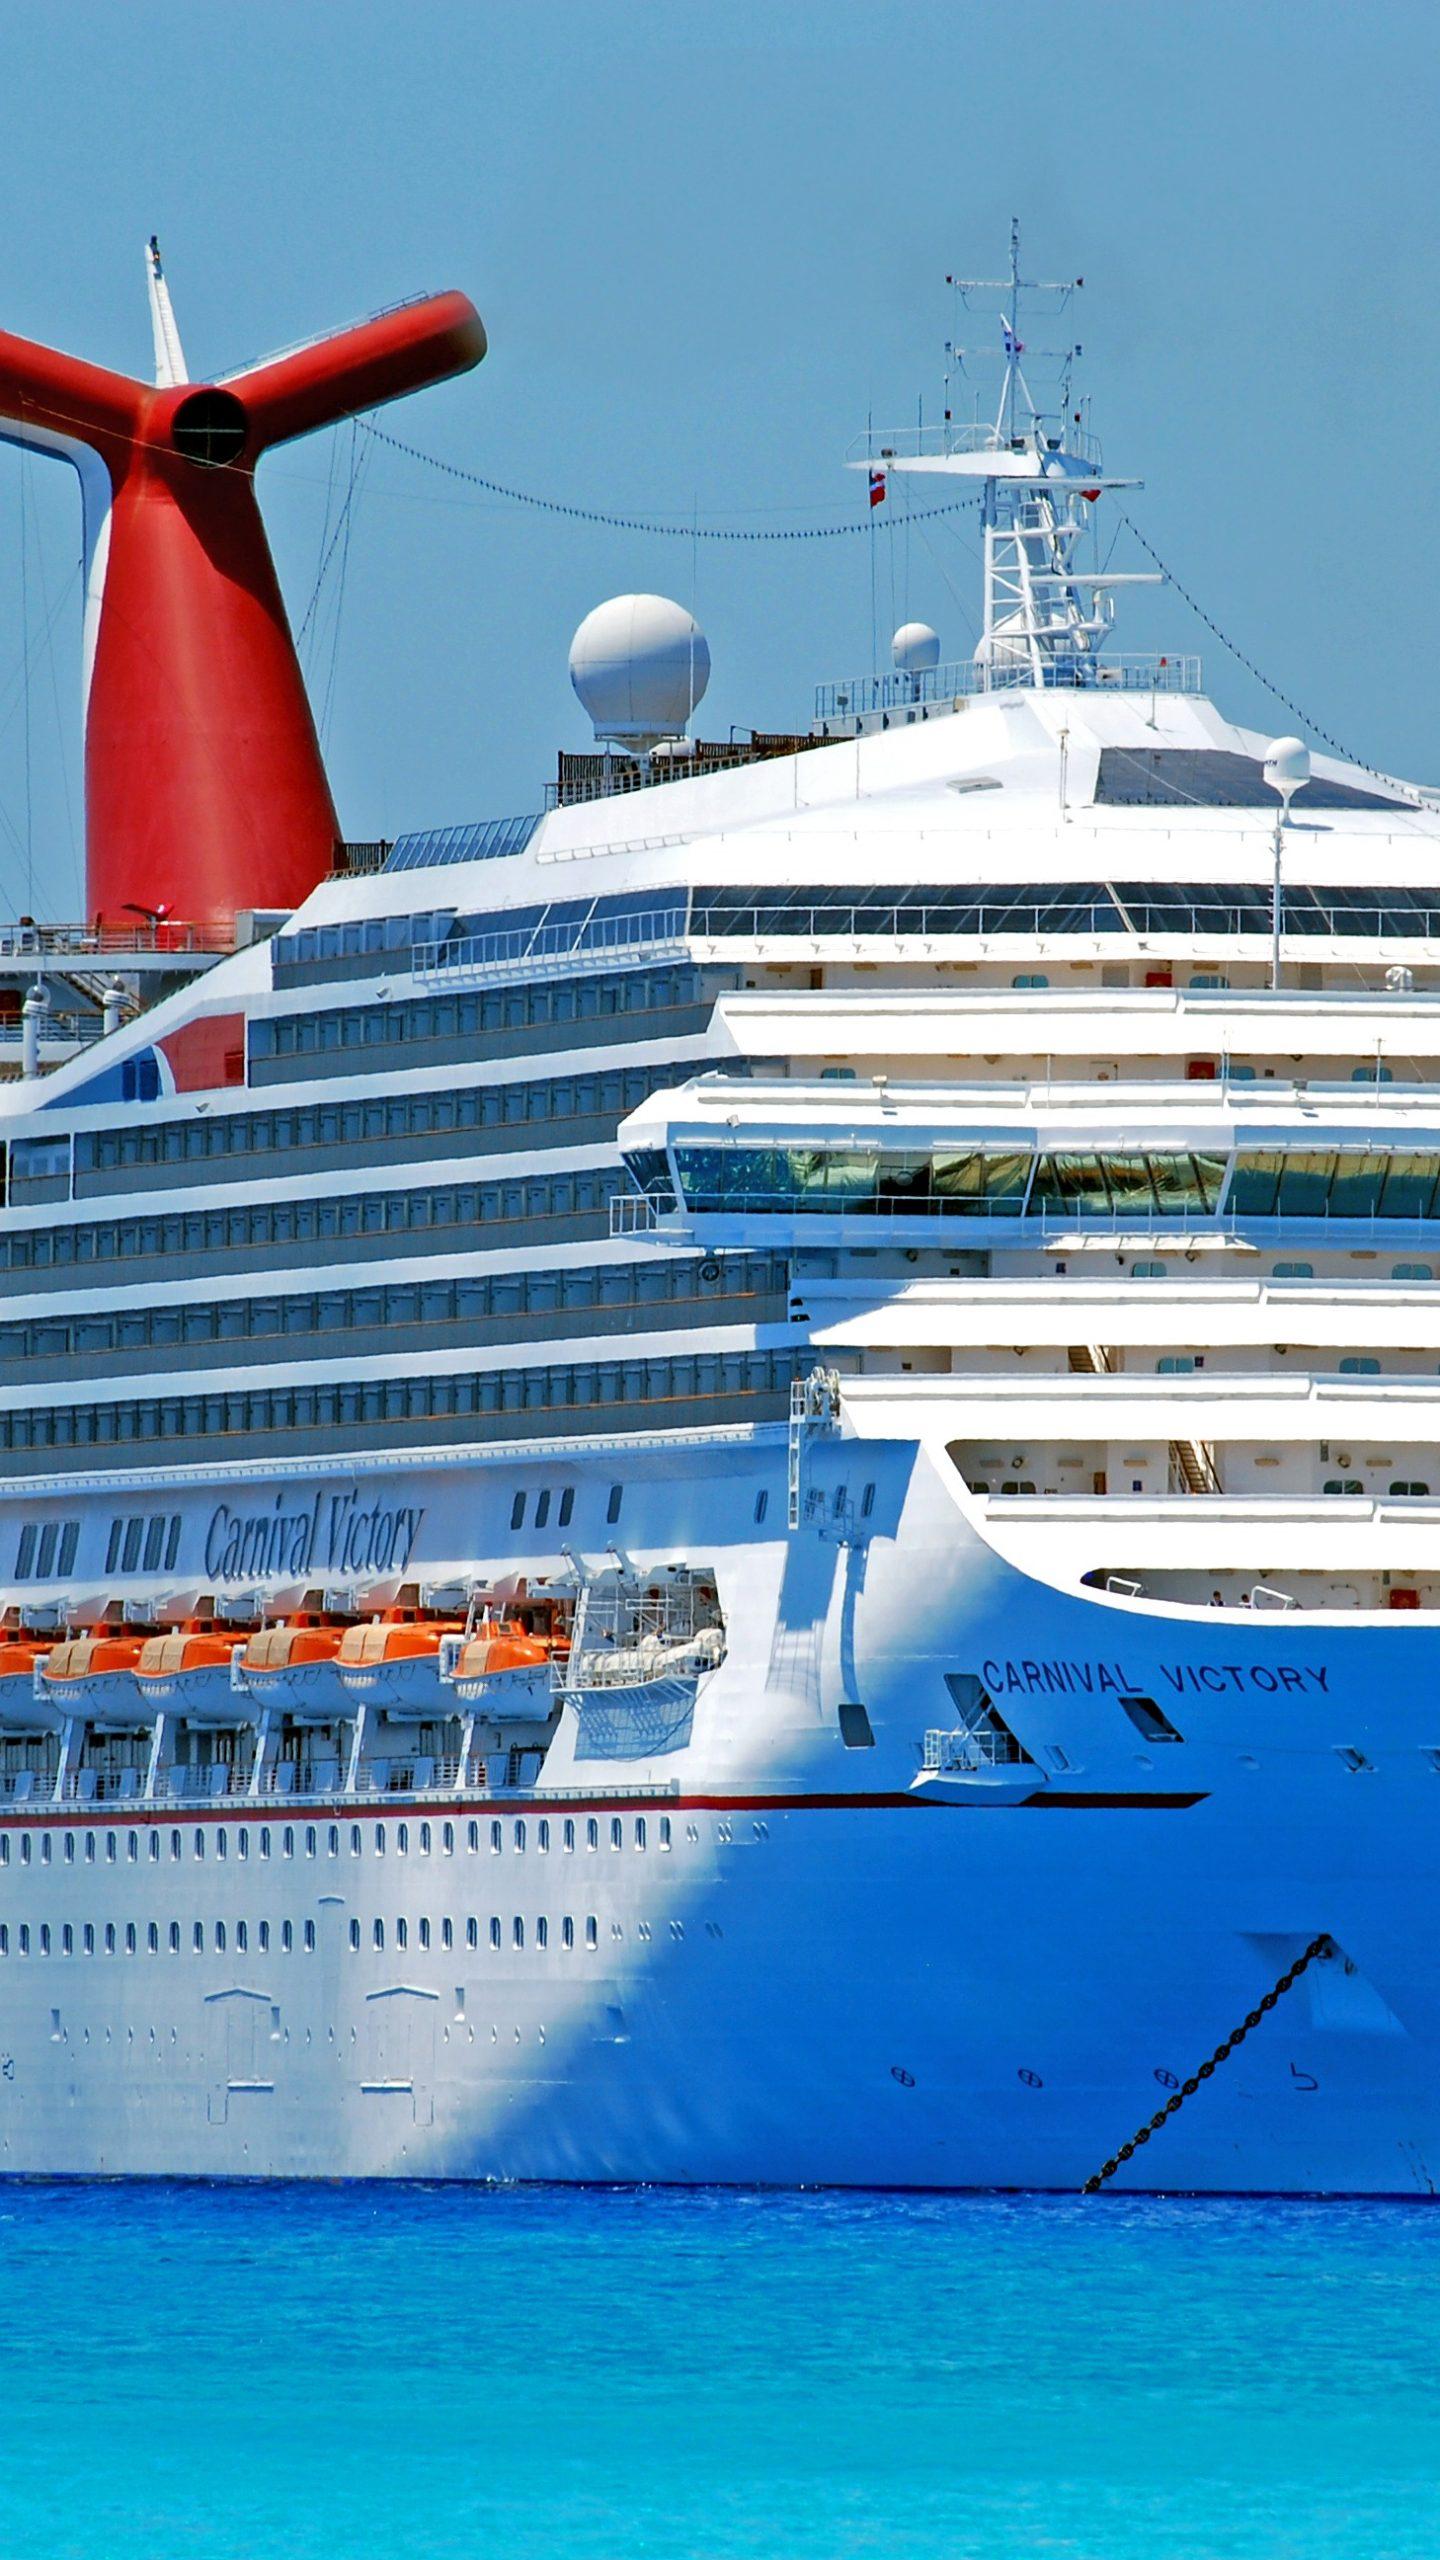 Carnival Victory Cruise Ship 4k Uhd Wallpaper